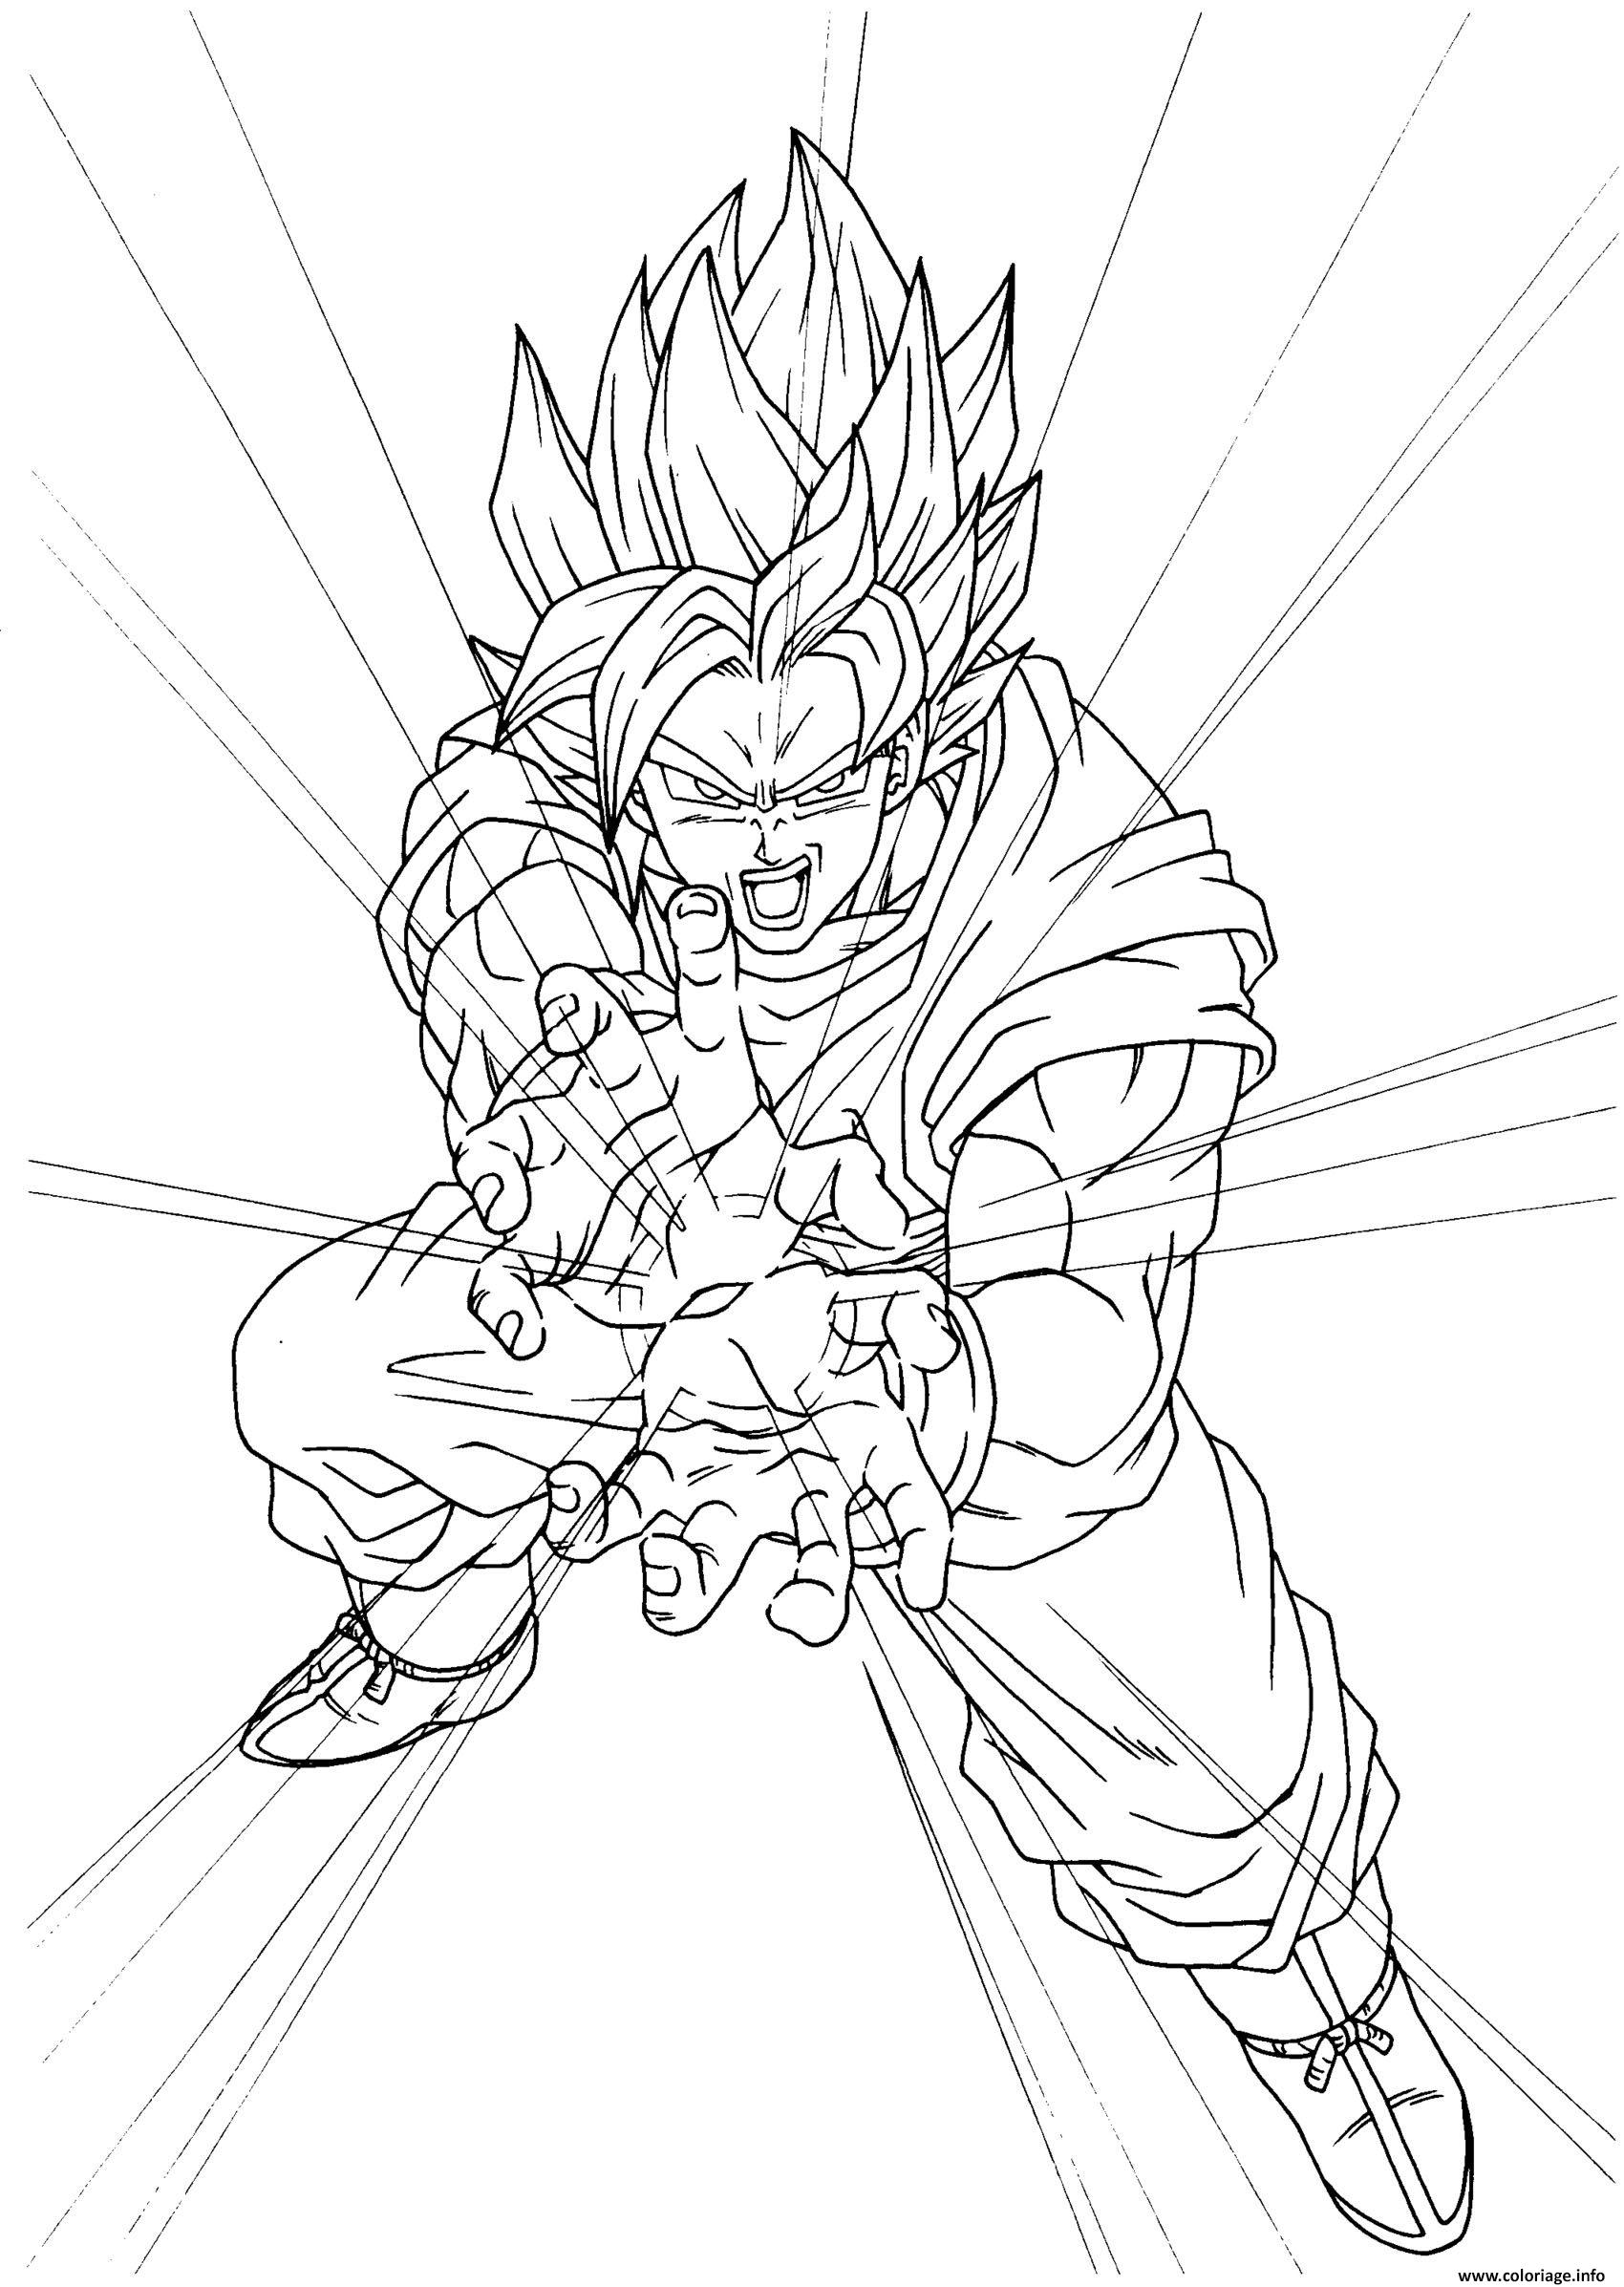 Coloriage Super Goku Super Sayen Dbz Dessin Dragon Ball Z A Imprimer